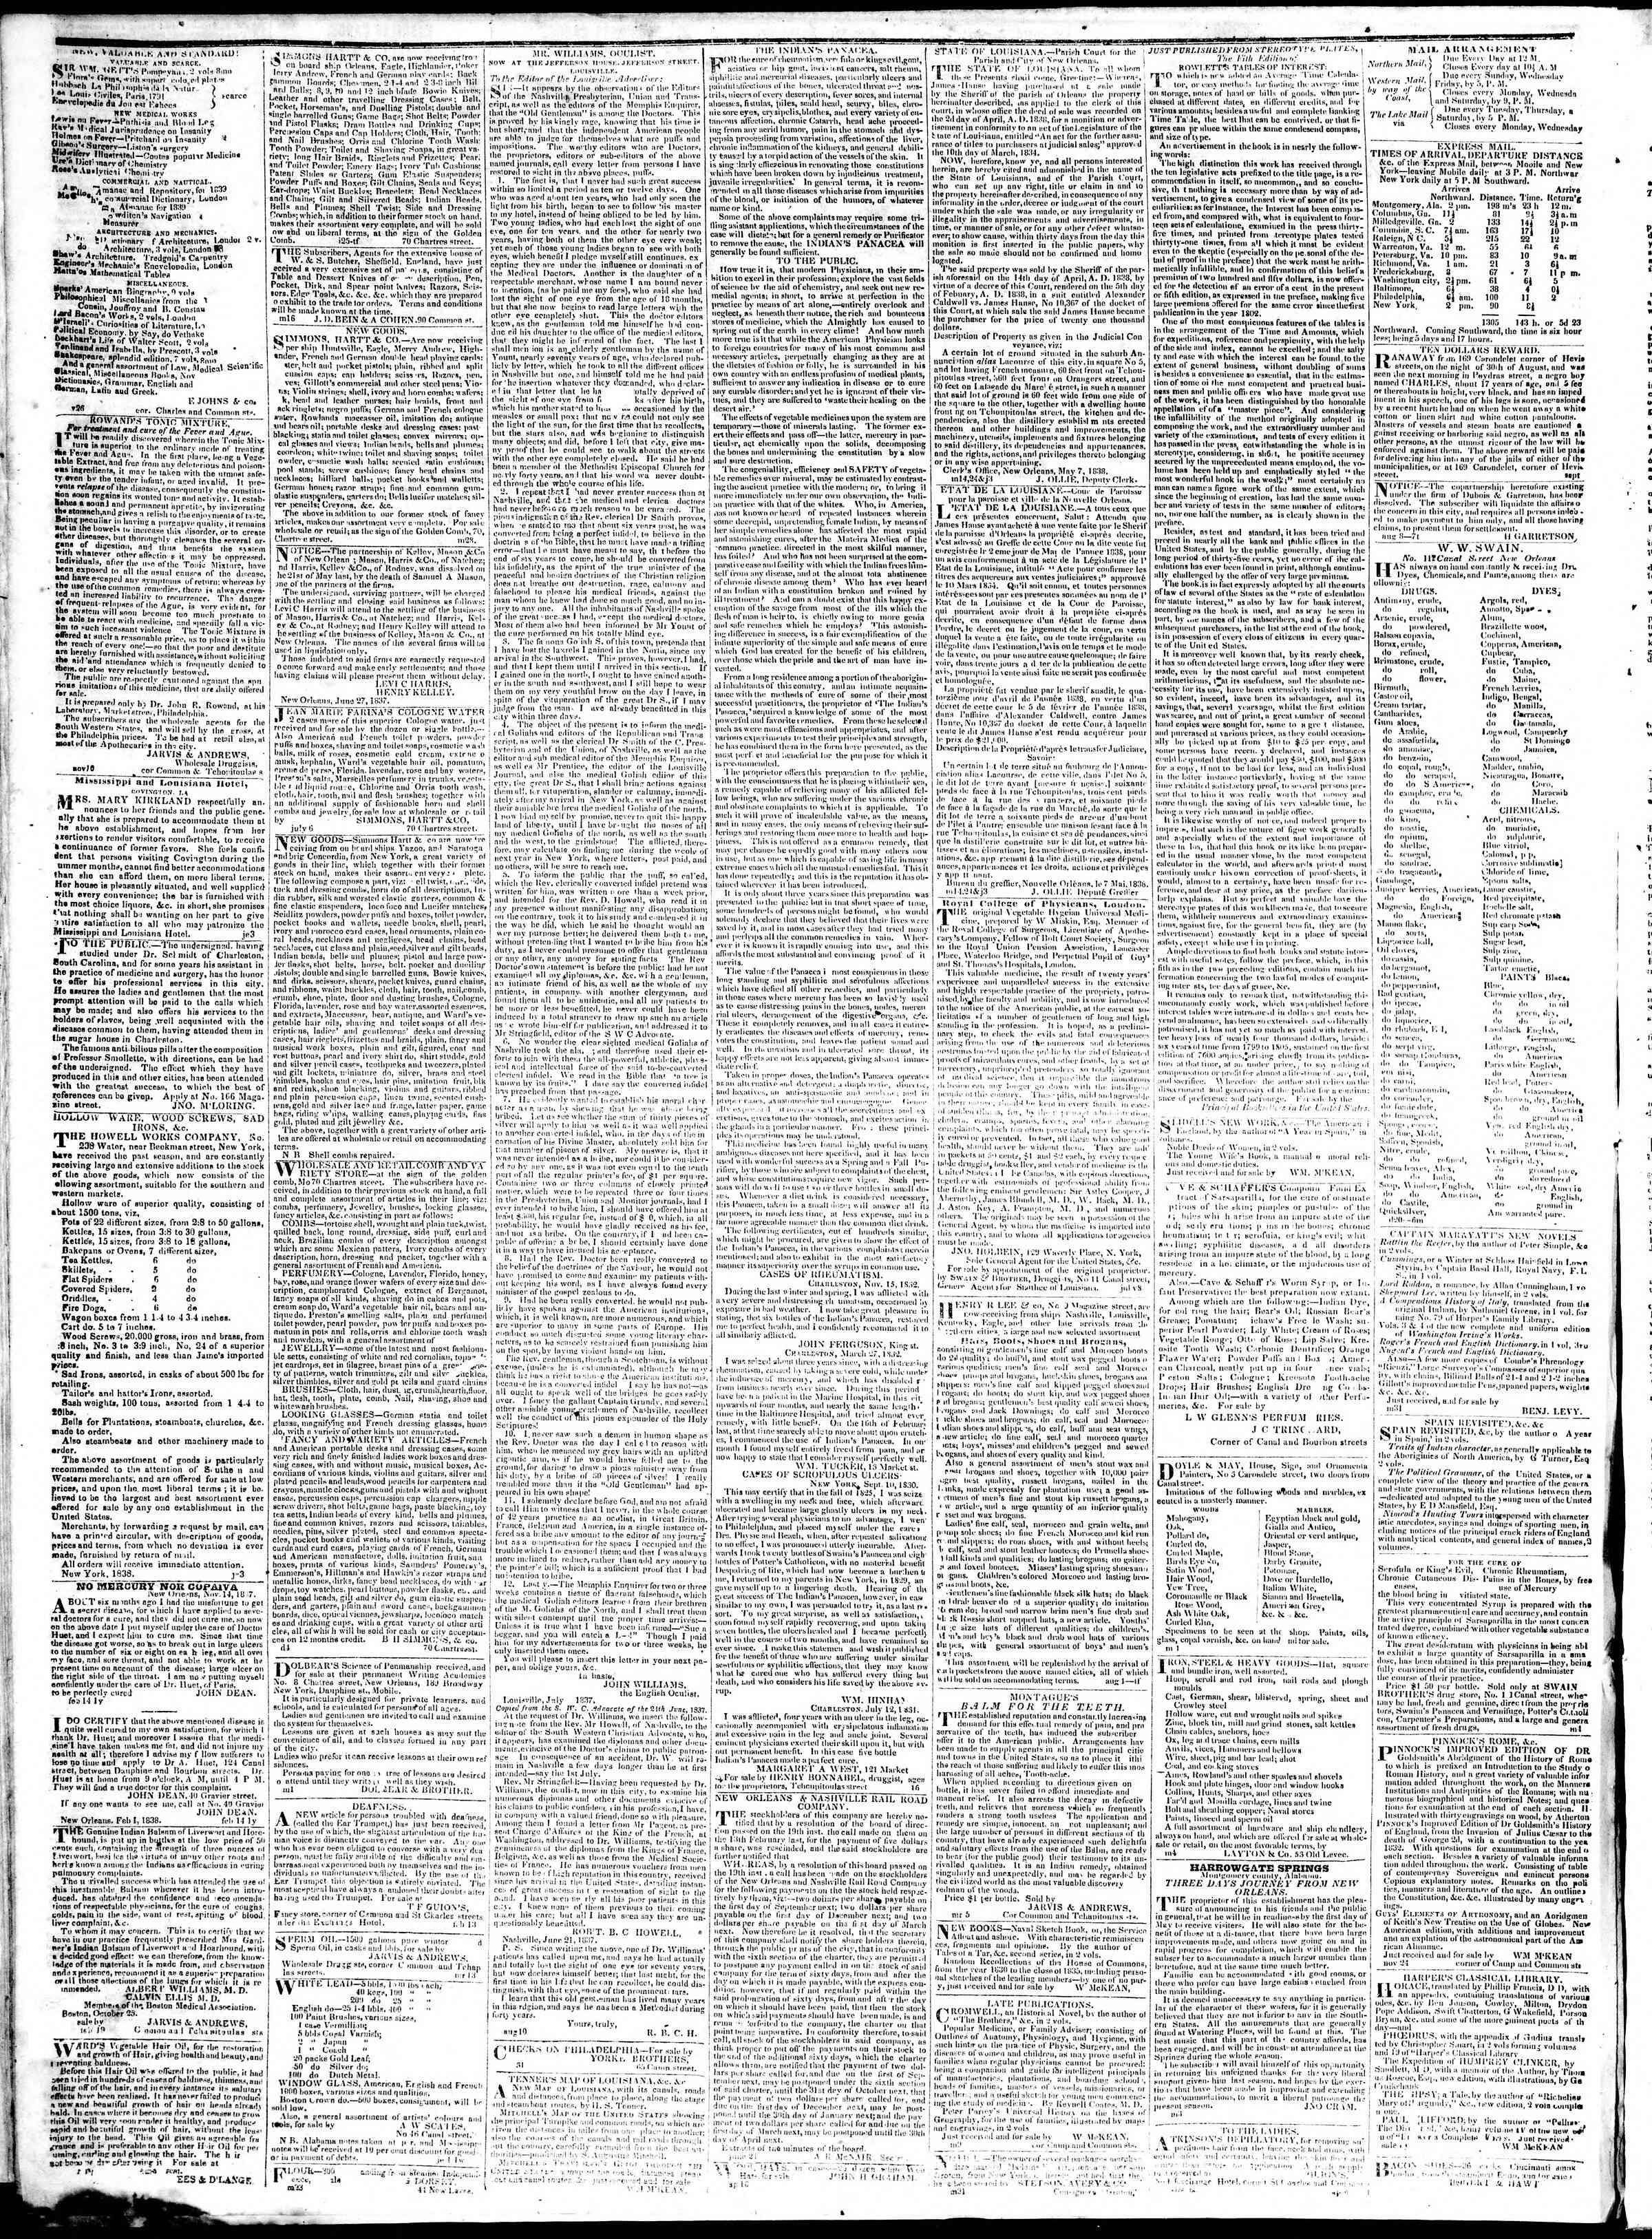 January 30, 1839 Tarihli True American Gazetesi Sayfa 4